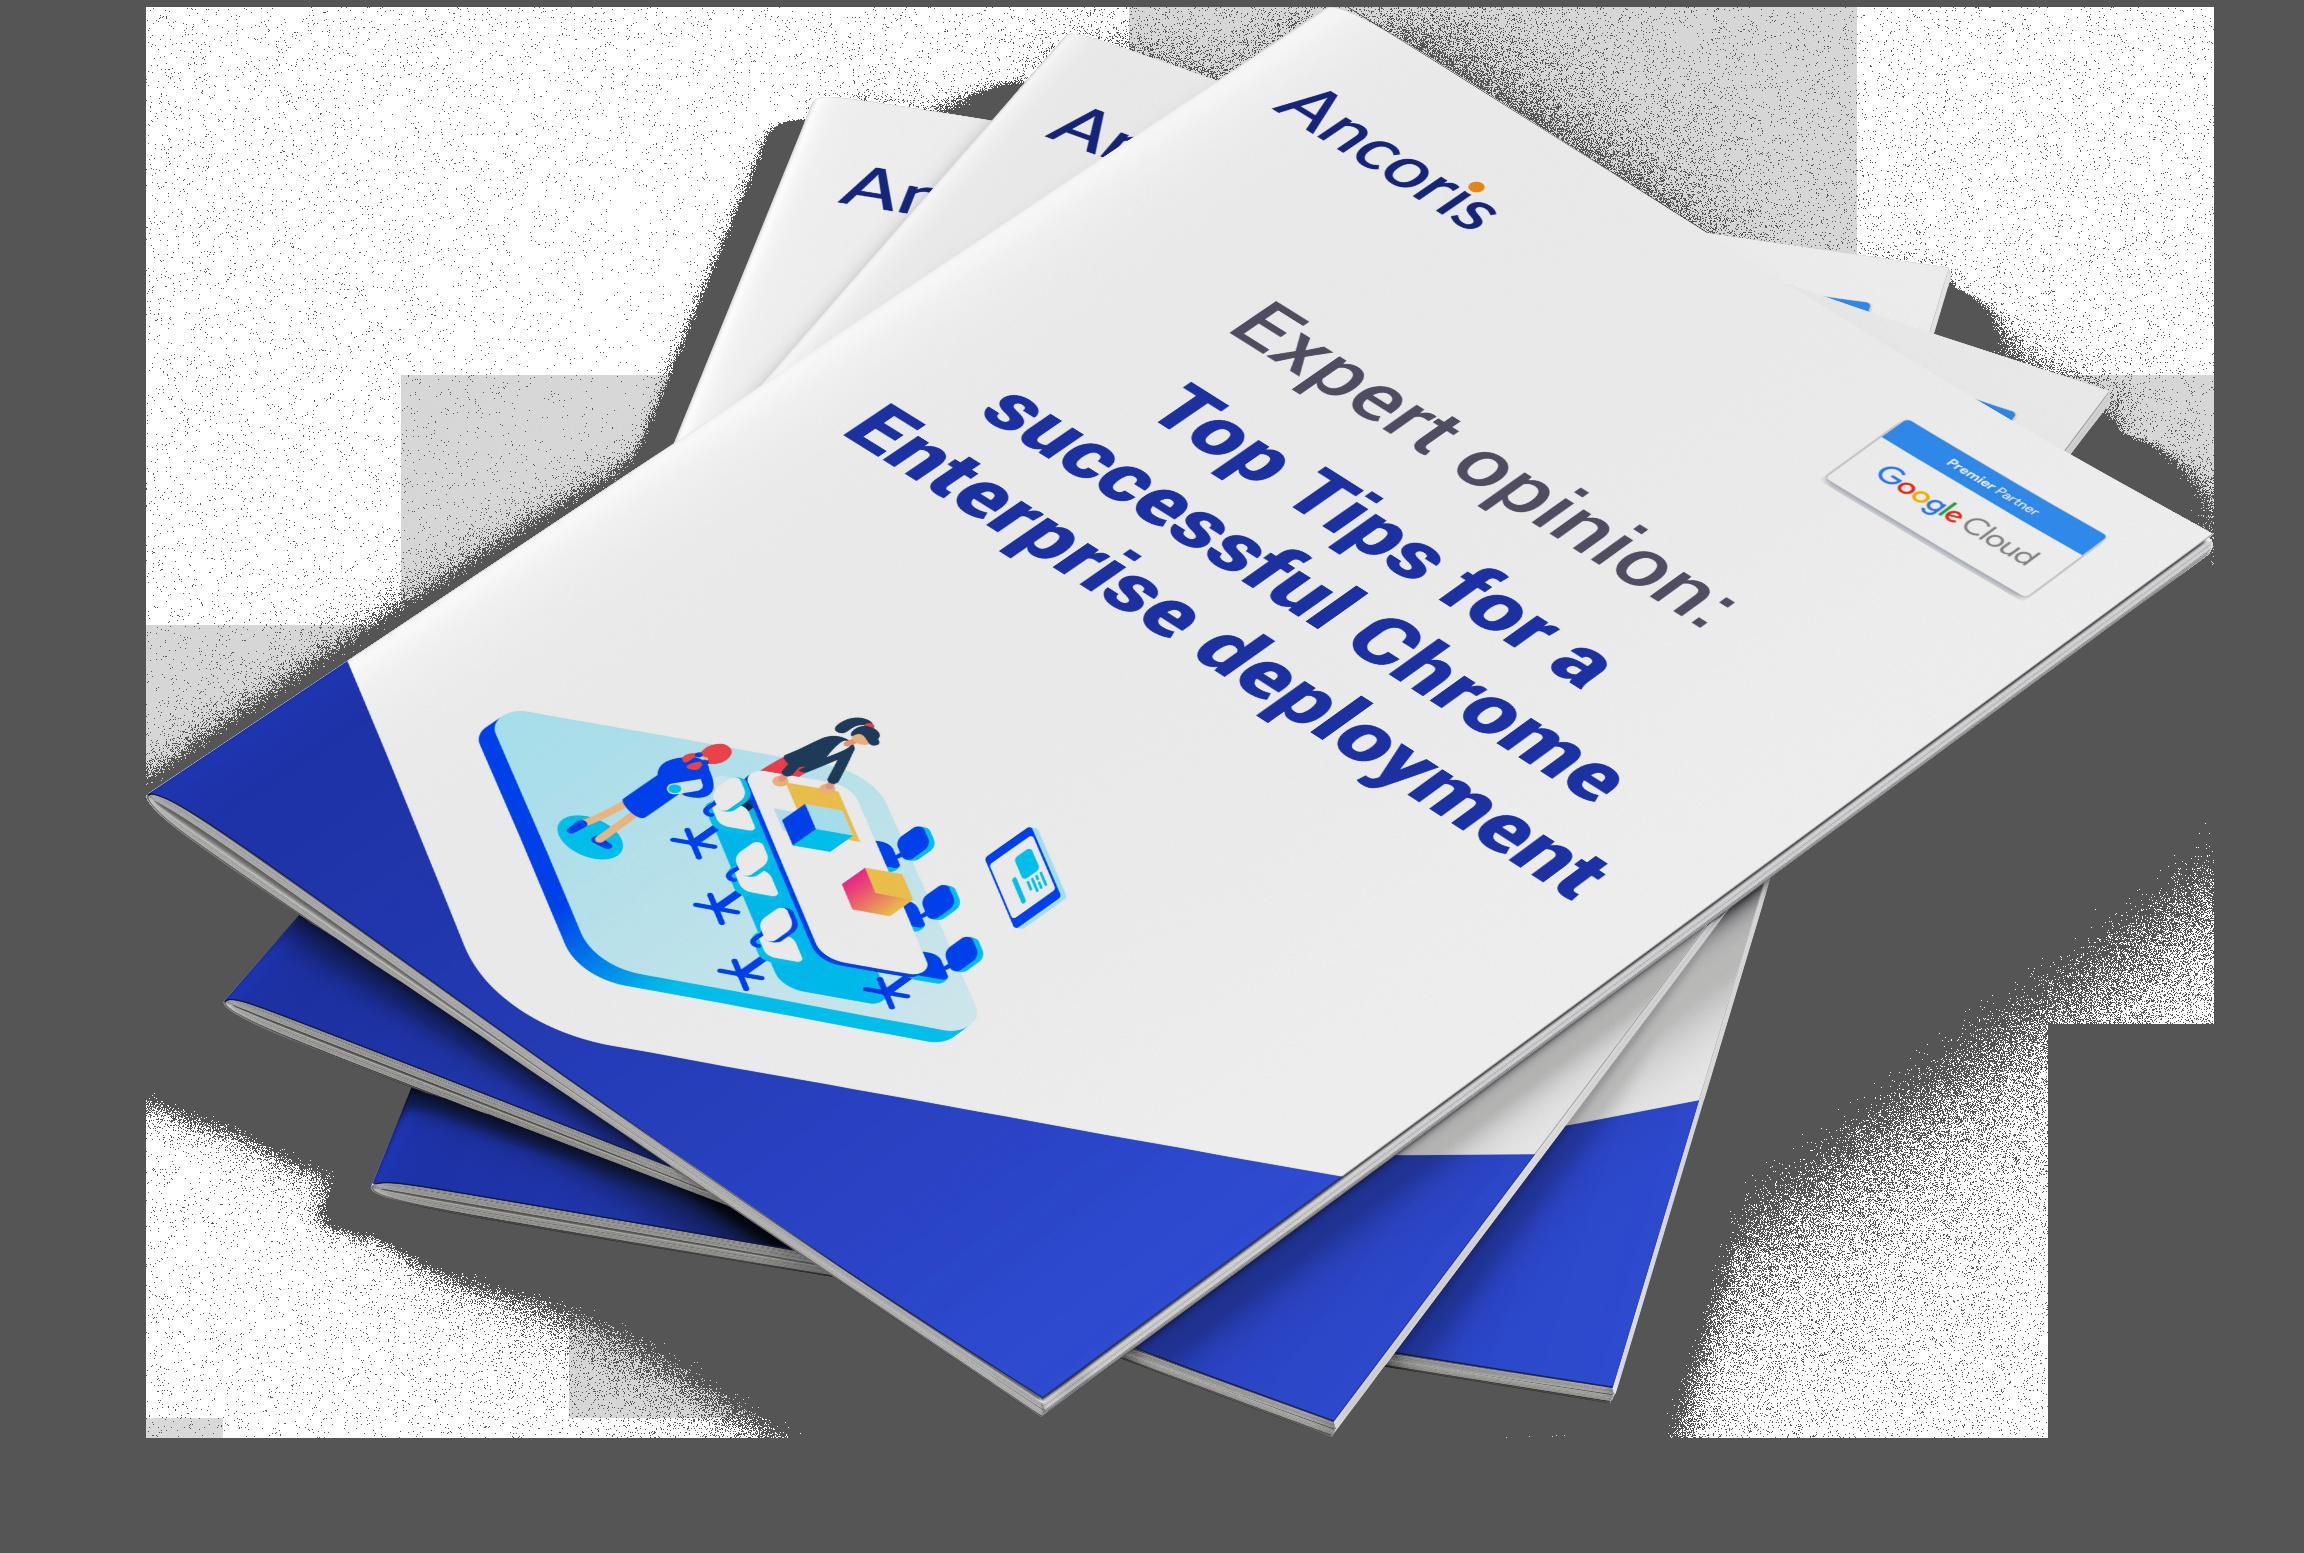 top-tips-for-chrome-enterprise-deployment